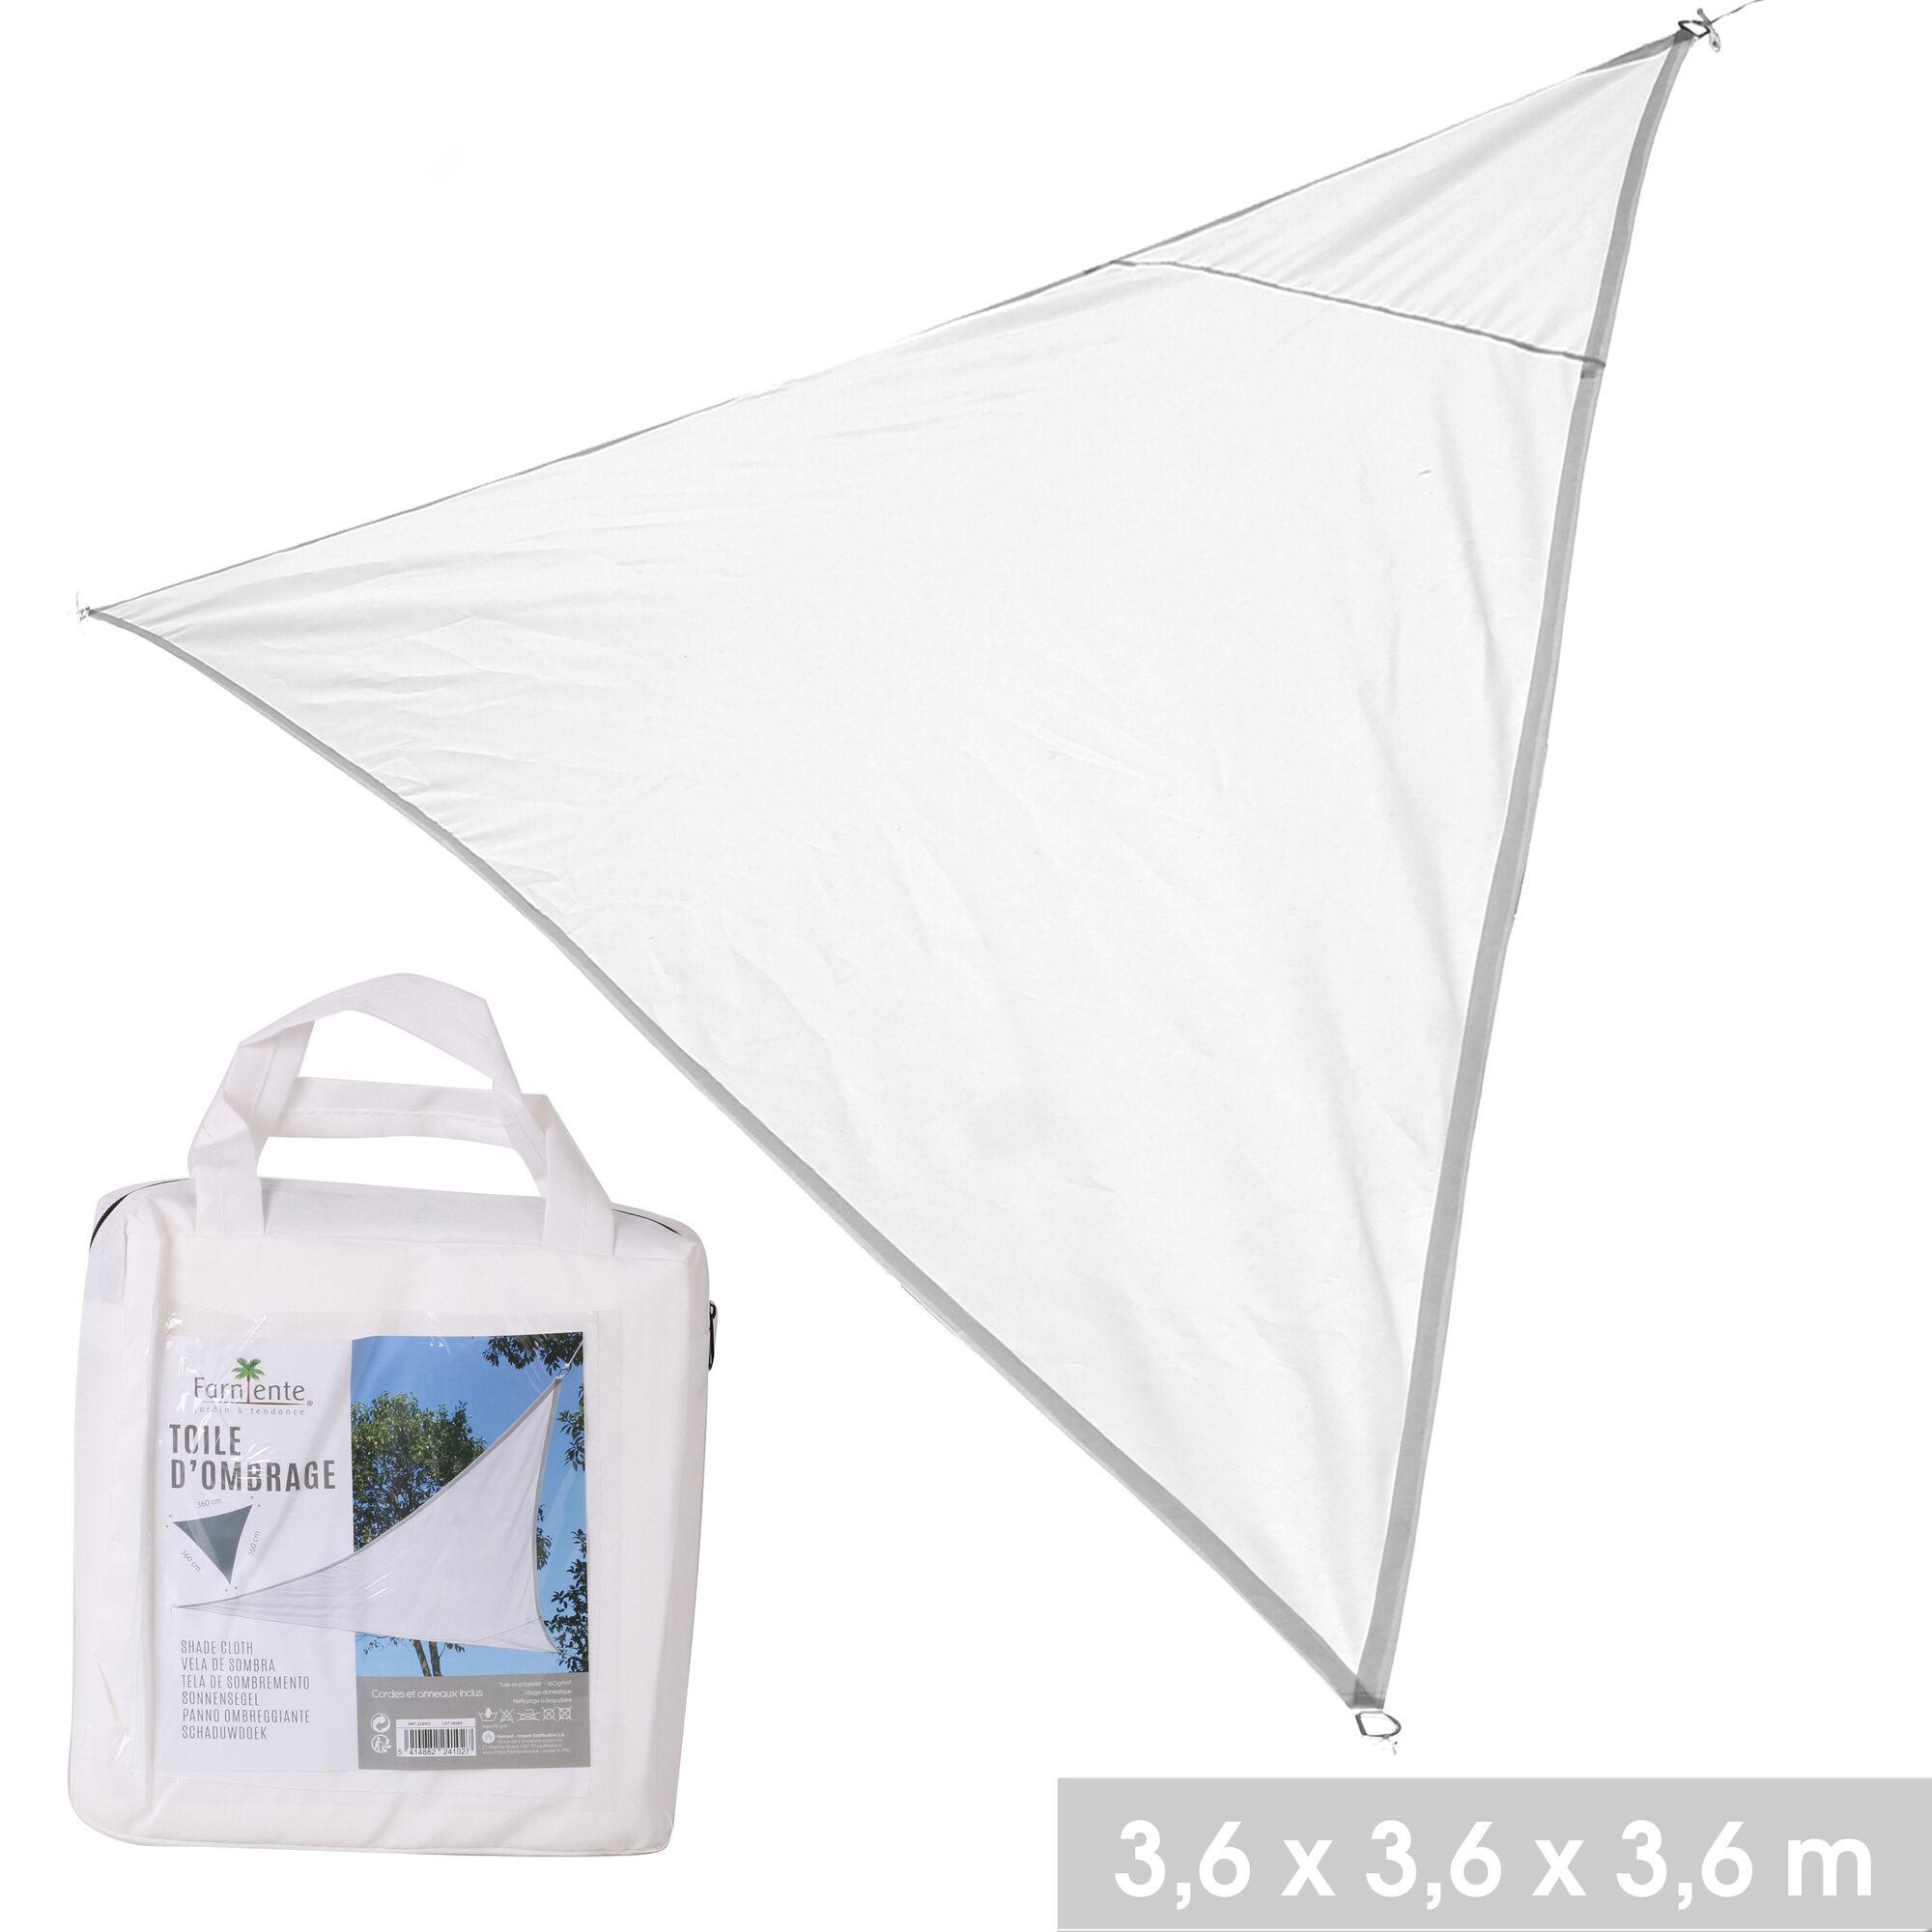 NOTRE SÉLECTION Toile d'ombrage triangle en polyester 3,6 x 3,6 x 3,6 m blanc